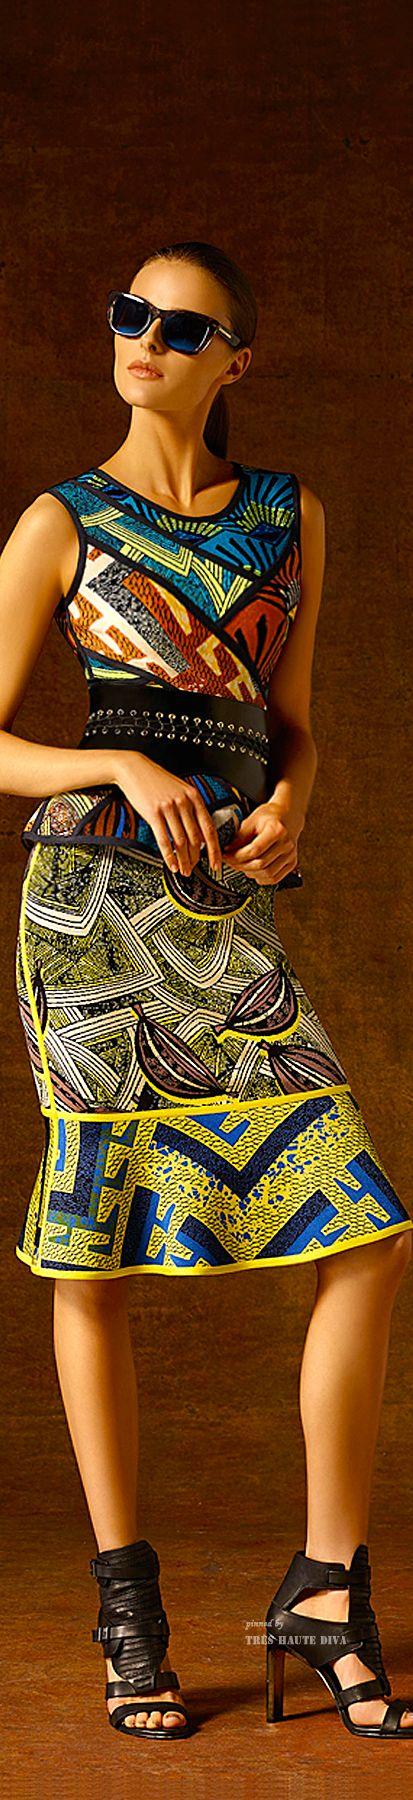 Hervé Léger by Max Azria Pre-Fall 2015 ~Latest African Fashion, African Prints, African fashion styles, African clothing, Nigerian style, Ghanaian fashion, African women dresses, African Bags, African shoes, Nigerian fashion, Ankara, Kitenge, Aso okè, Kenté, brocade. ~DKK